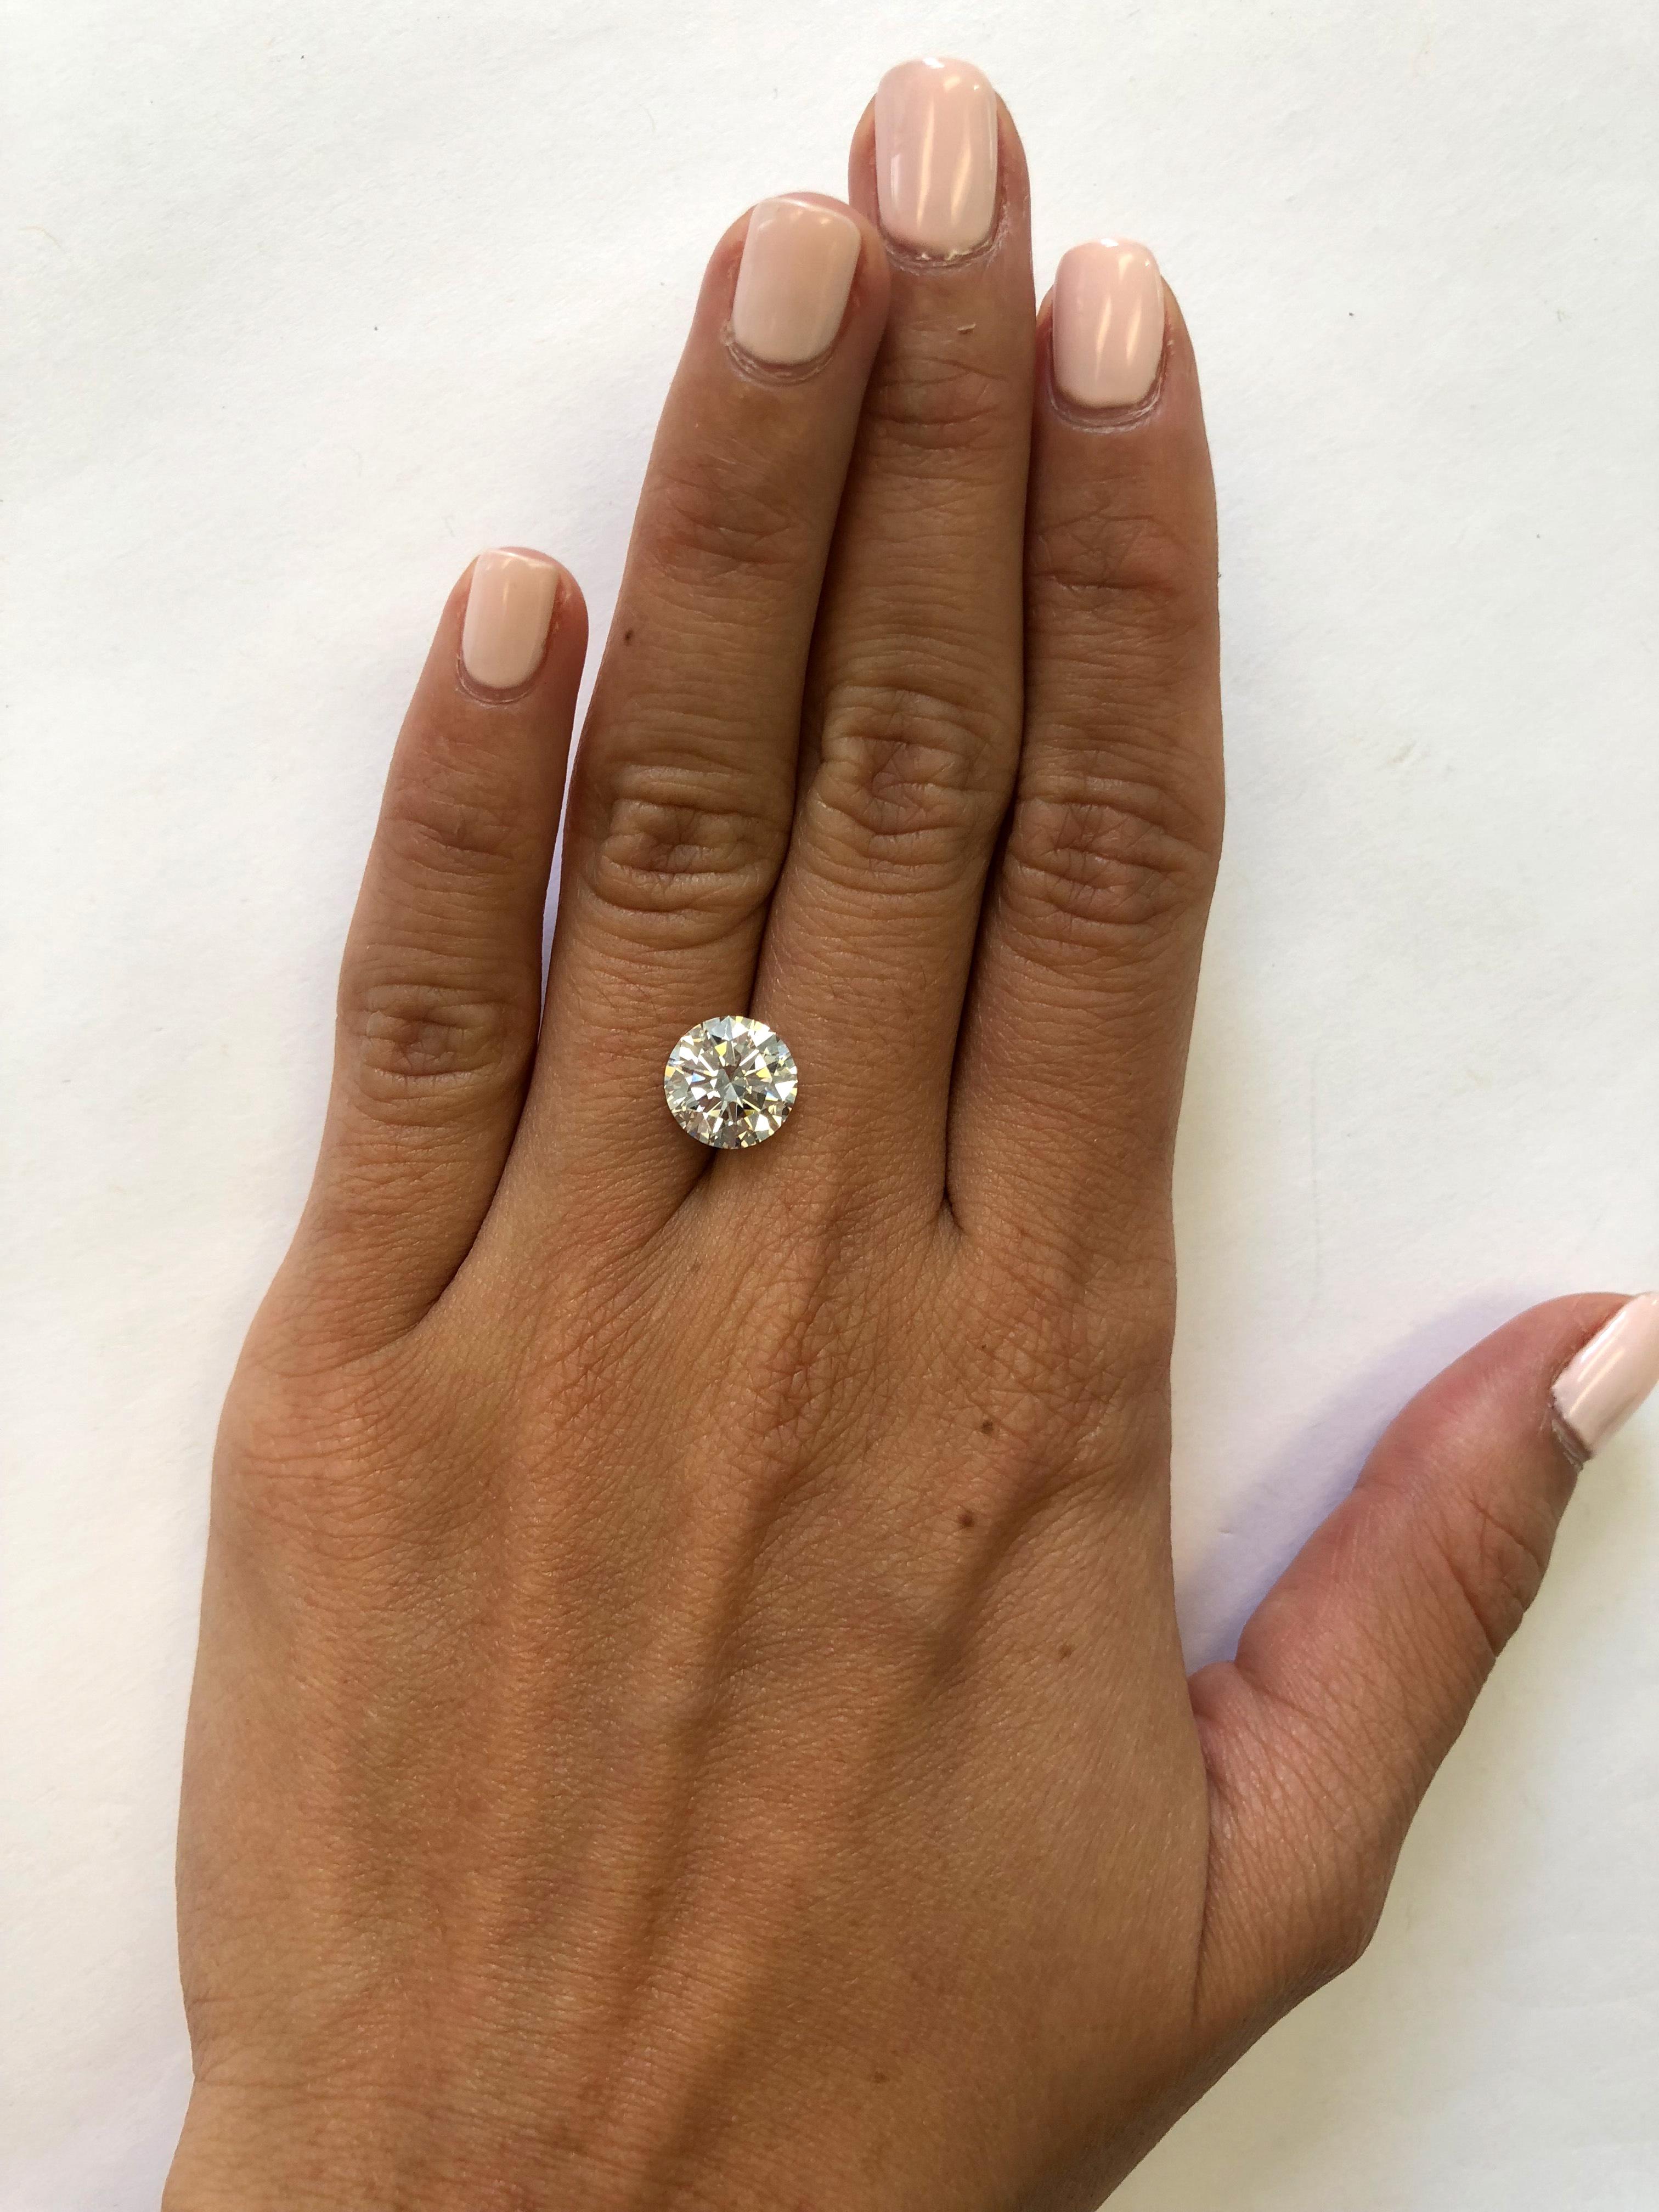 hand with 2.5 carat diamond